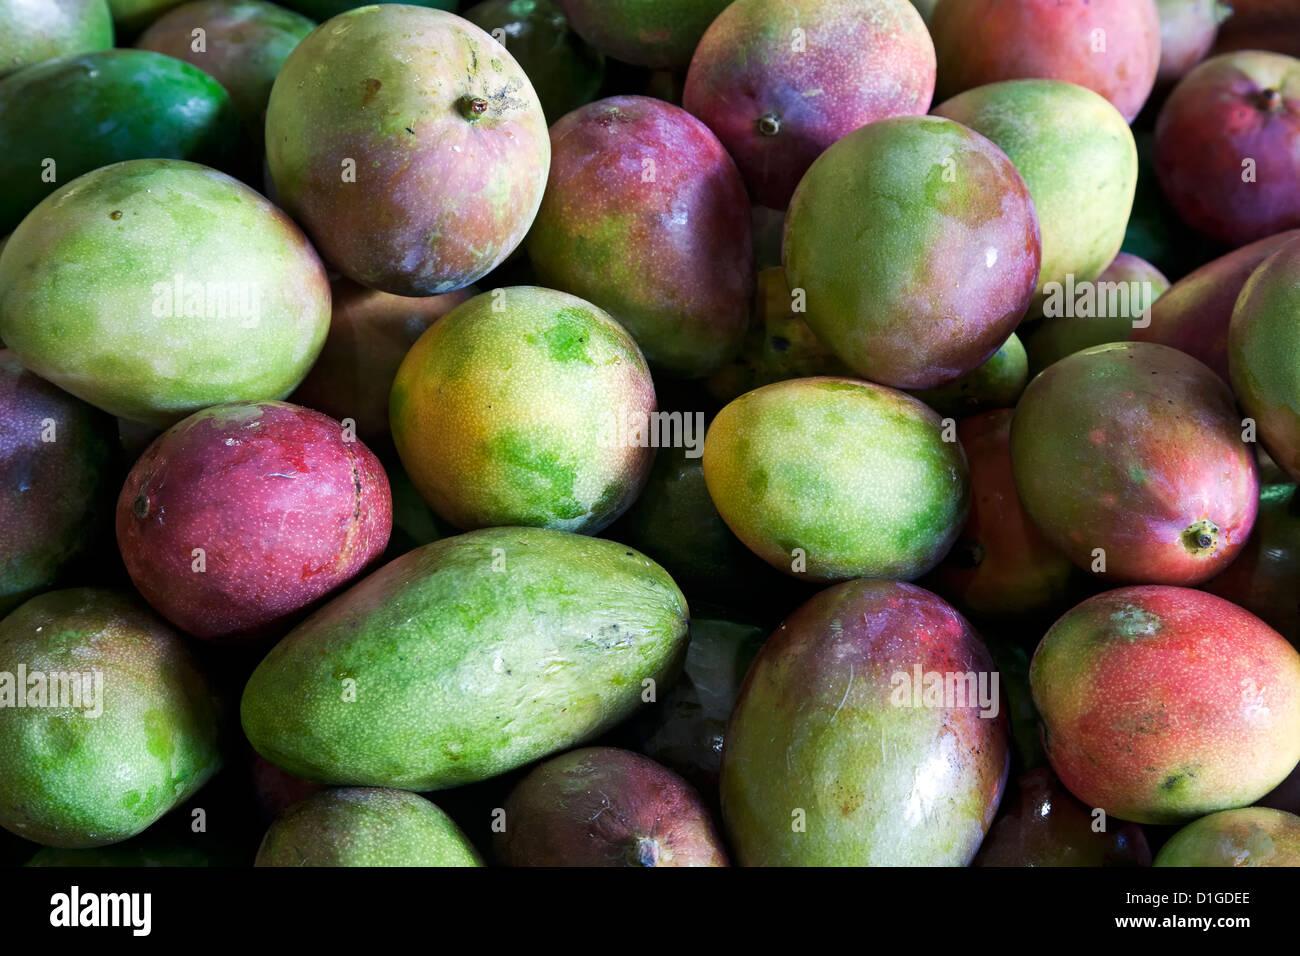 Mangoes, Plaza del Mercado, Santurce, Puerto Rico - Stock Image